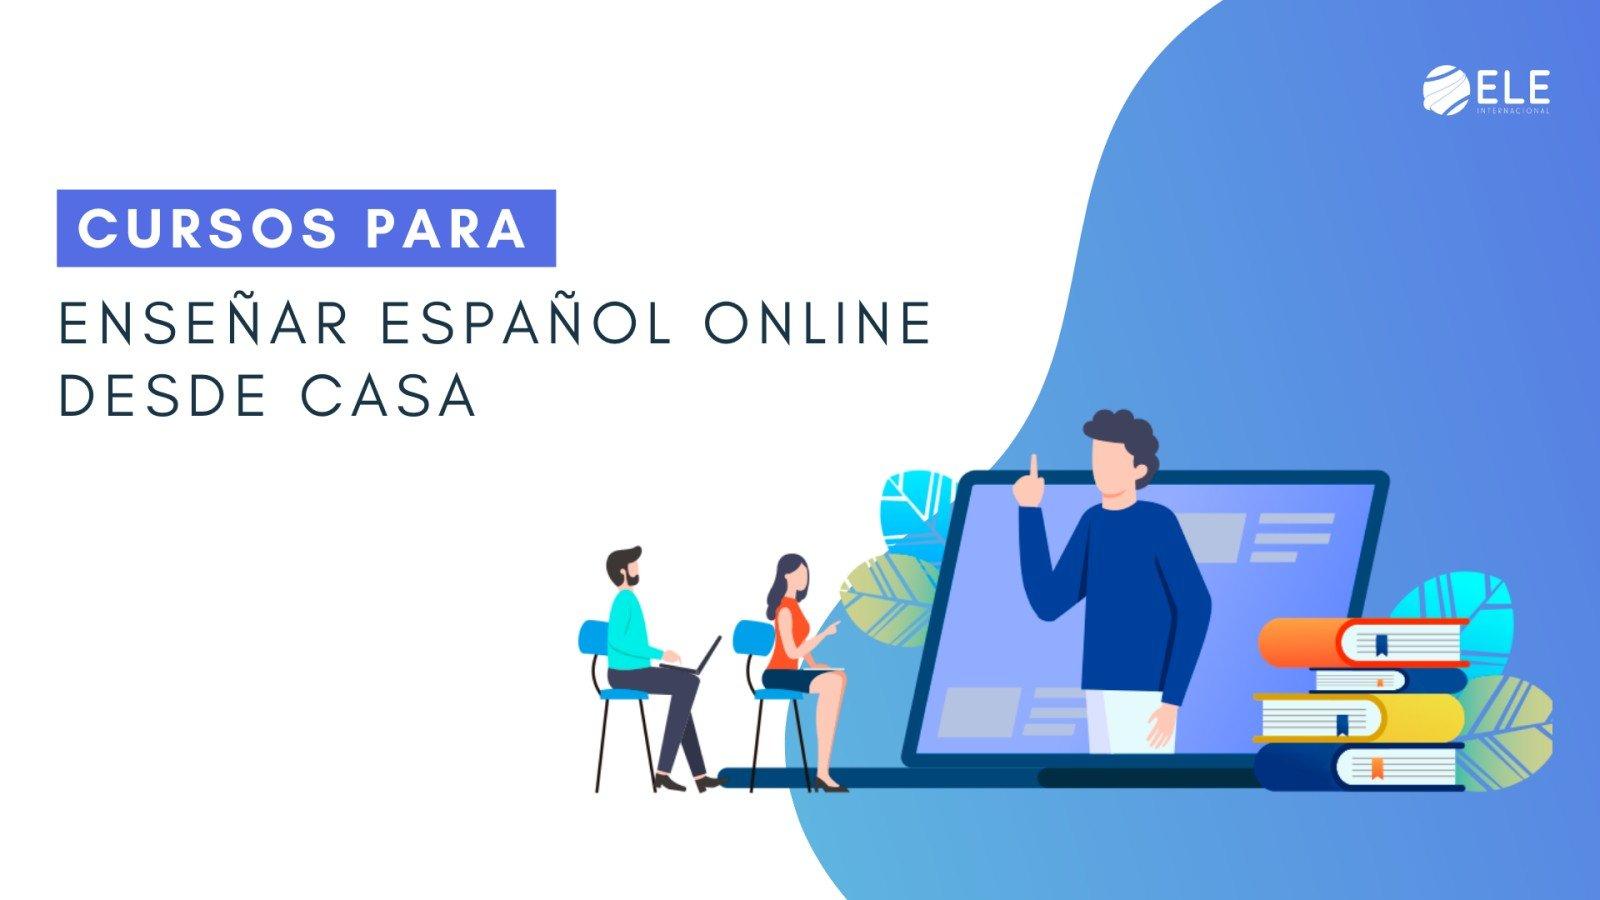 curso para enseñar español online desde casa